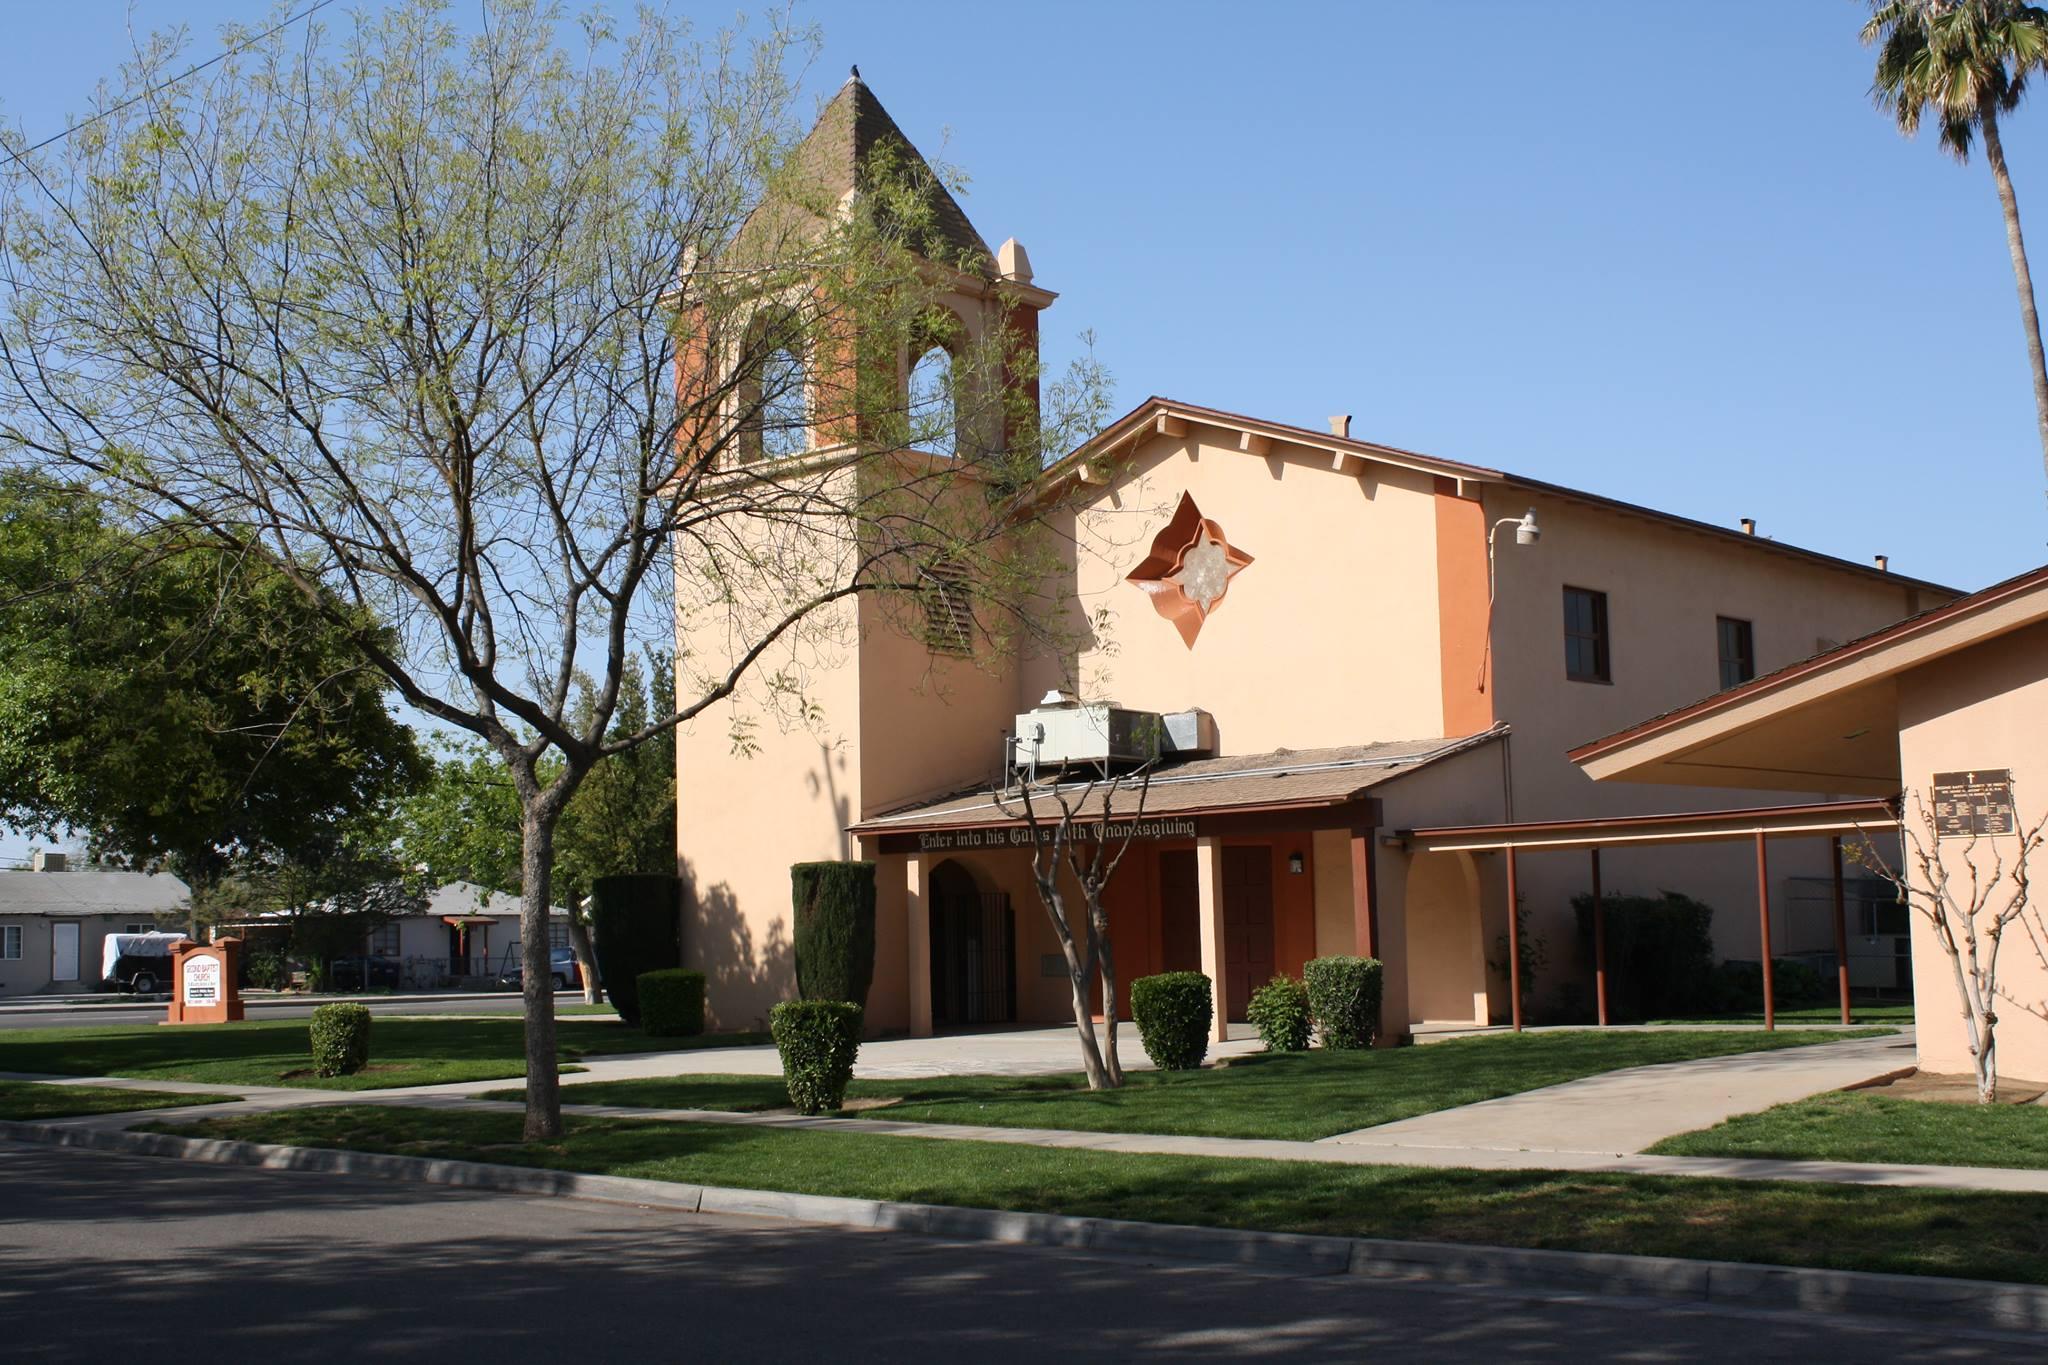 Second Baptist Church (USDA) Food Pantry